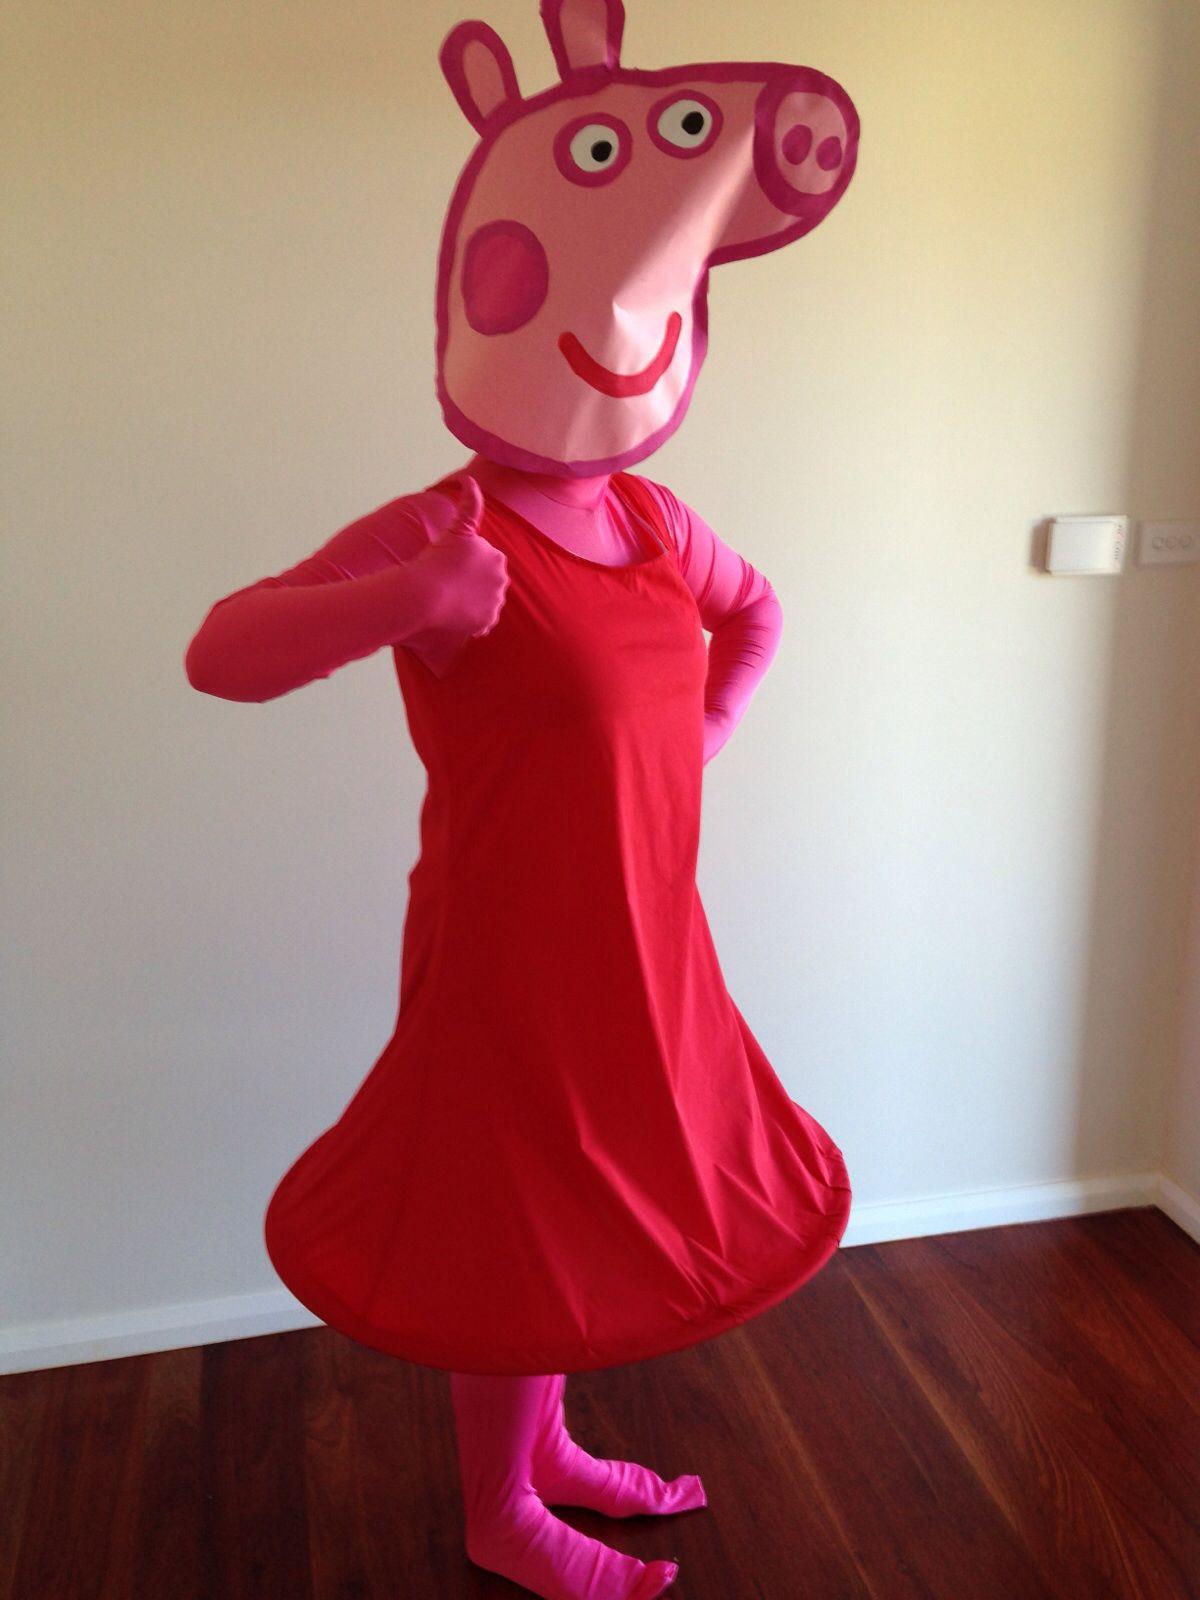 Peppa Pig Costume DIY  DIY Peppa Pig Costume Head Paint and Cardboard Dress Red